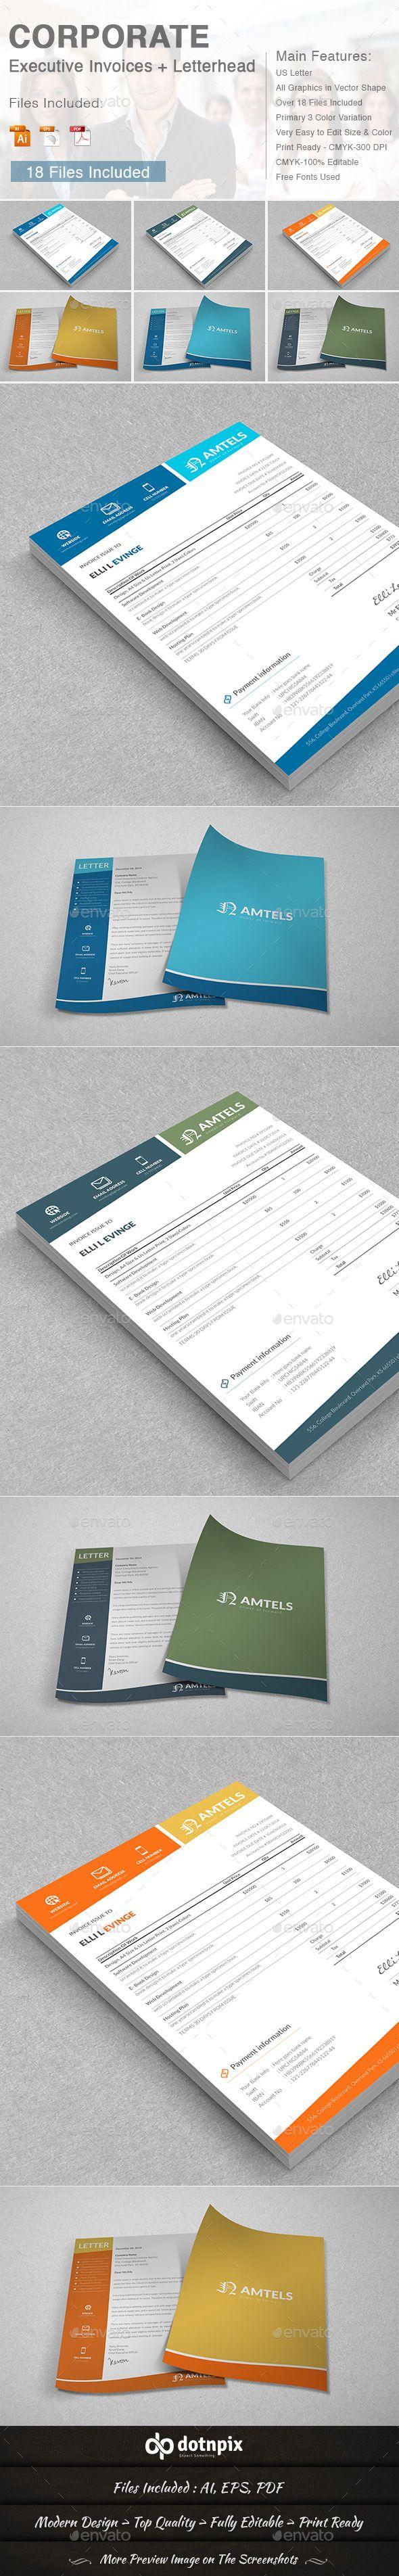 Corporate Executive Invoices + Letterhead Template #design Download: http://graphicriver.net/item/corporate-executive-invoices-letterhead/11274965?ref=ksioks